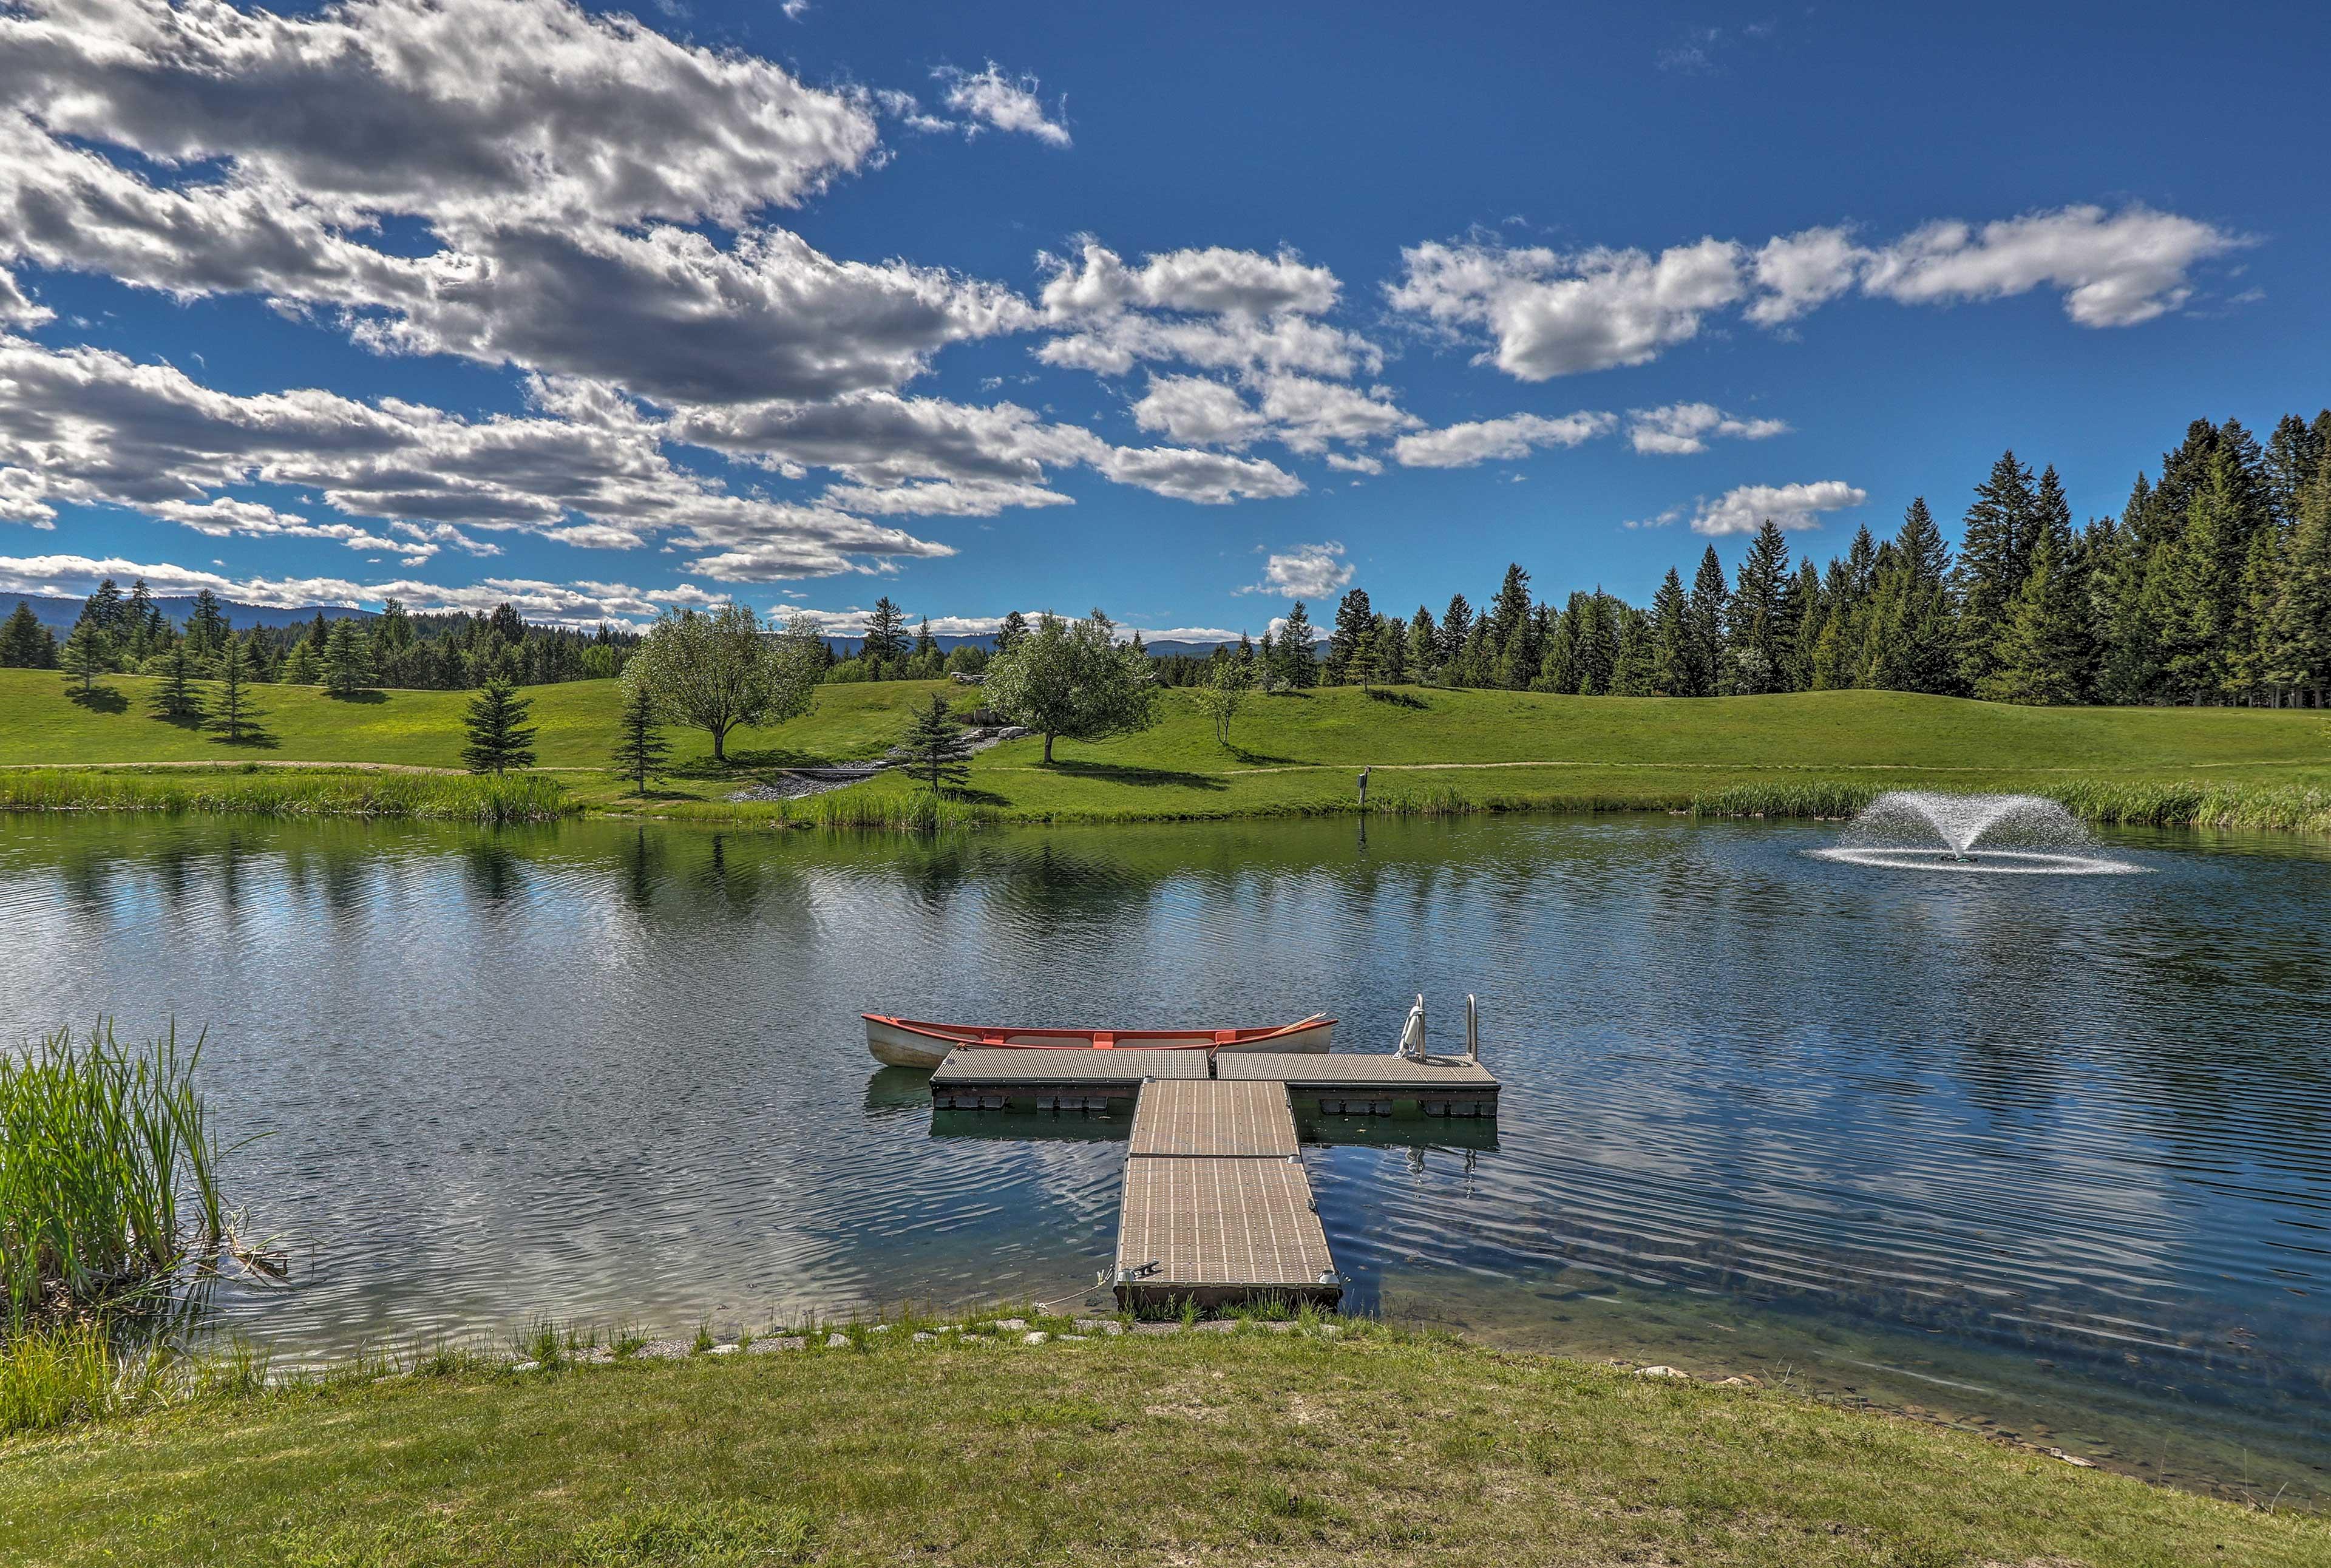 The vacation rental cabin is part of Glacier Ridge Ranch.